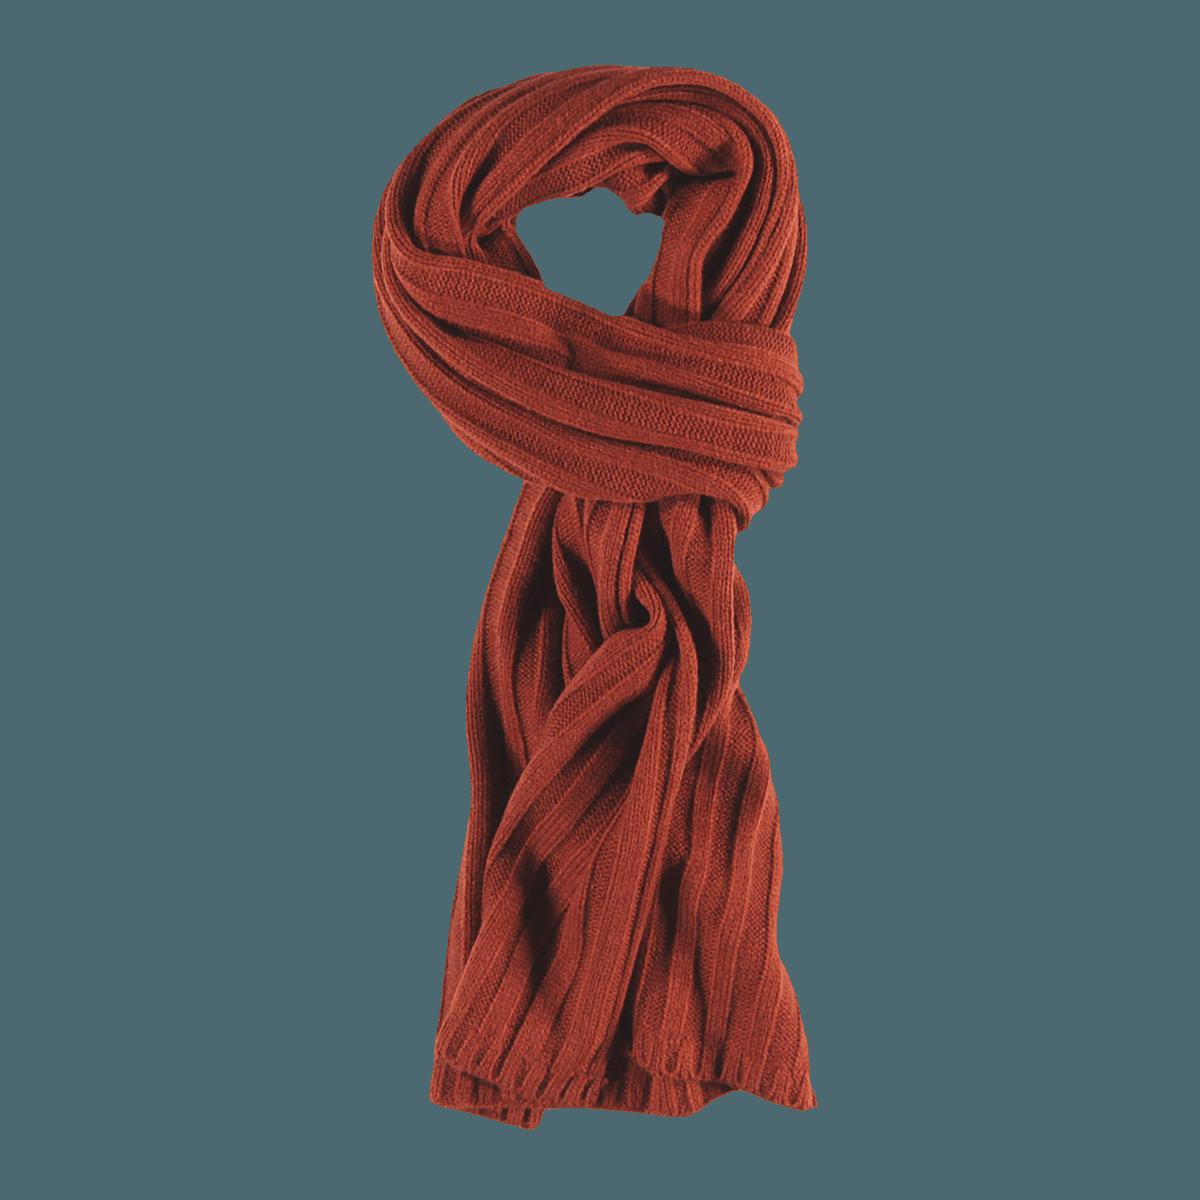 engbers Schal in Rostbraun kaufen | engbers.com